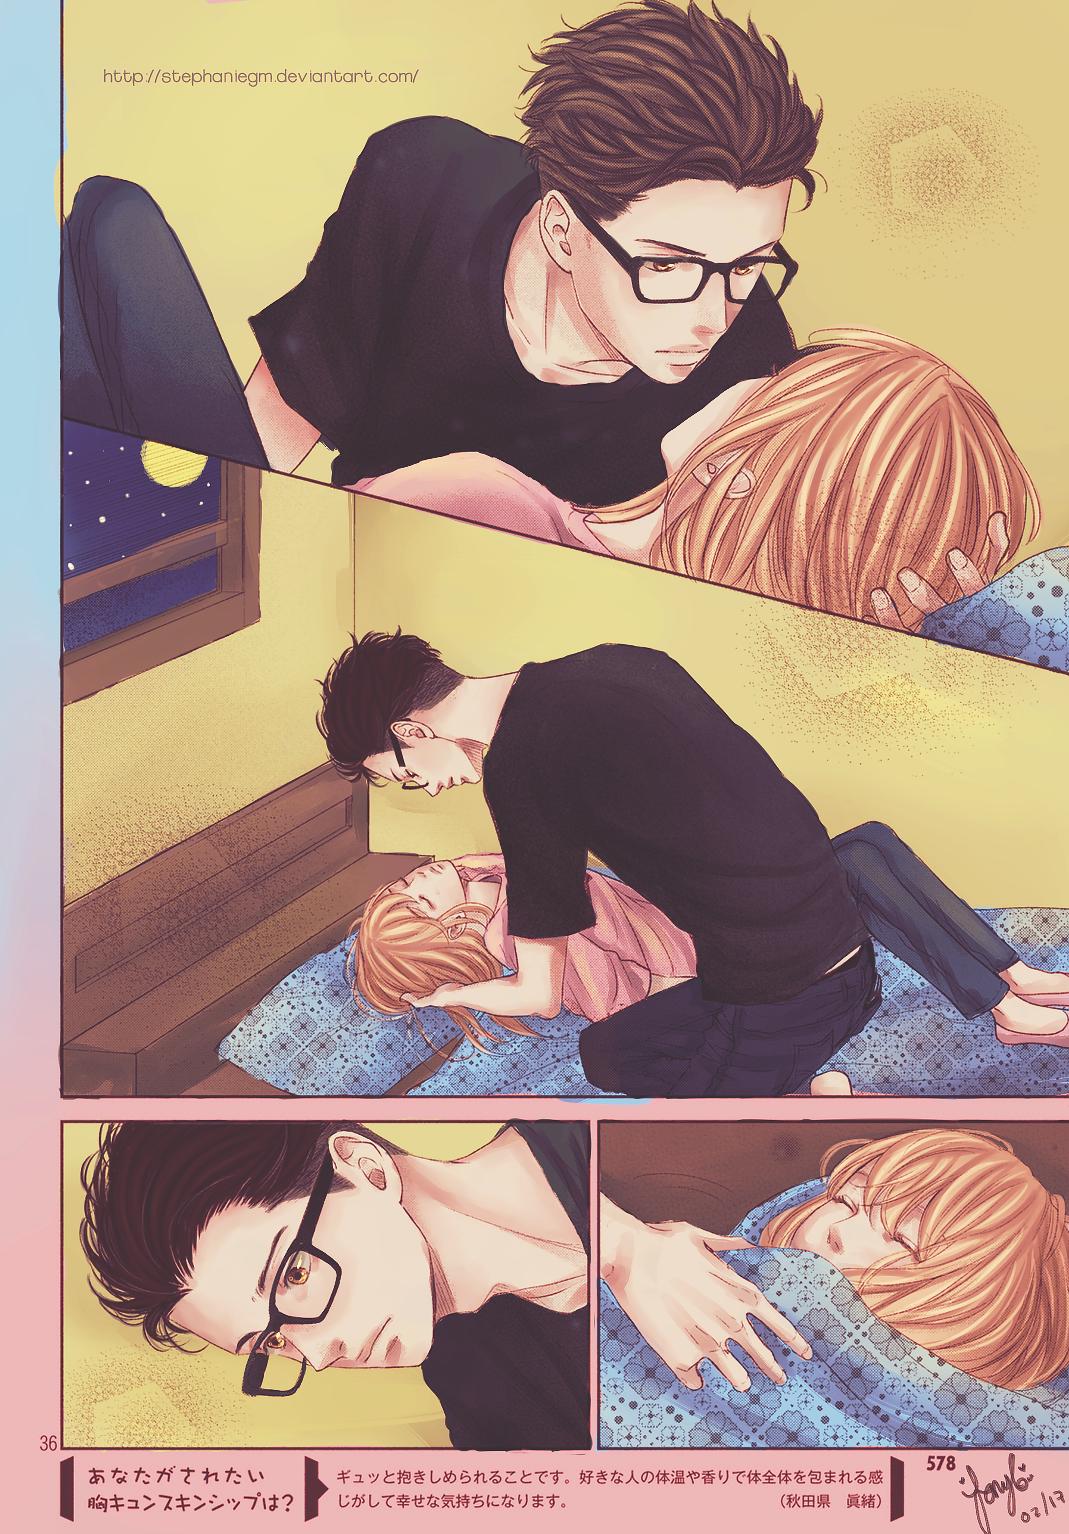 Living No Matsunaga San Vol 1 Ch 3 Page 39 Batoto Manga Shoujo Manga Amor Parejas De Anime Manga